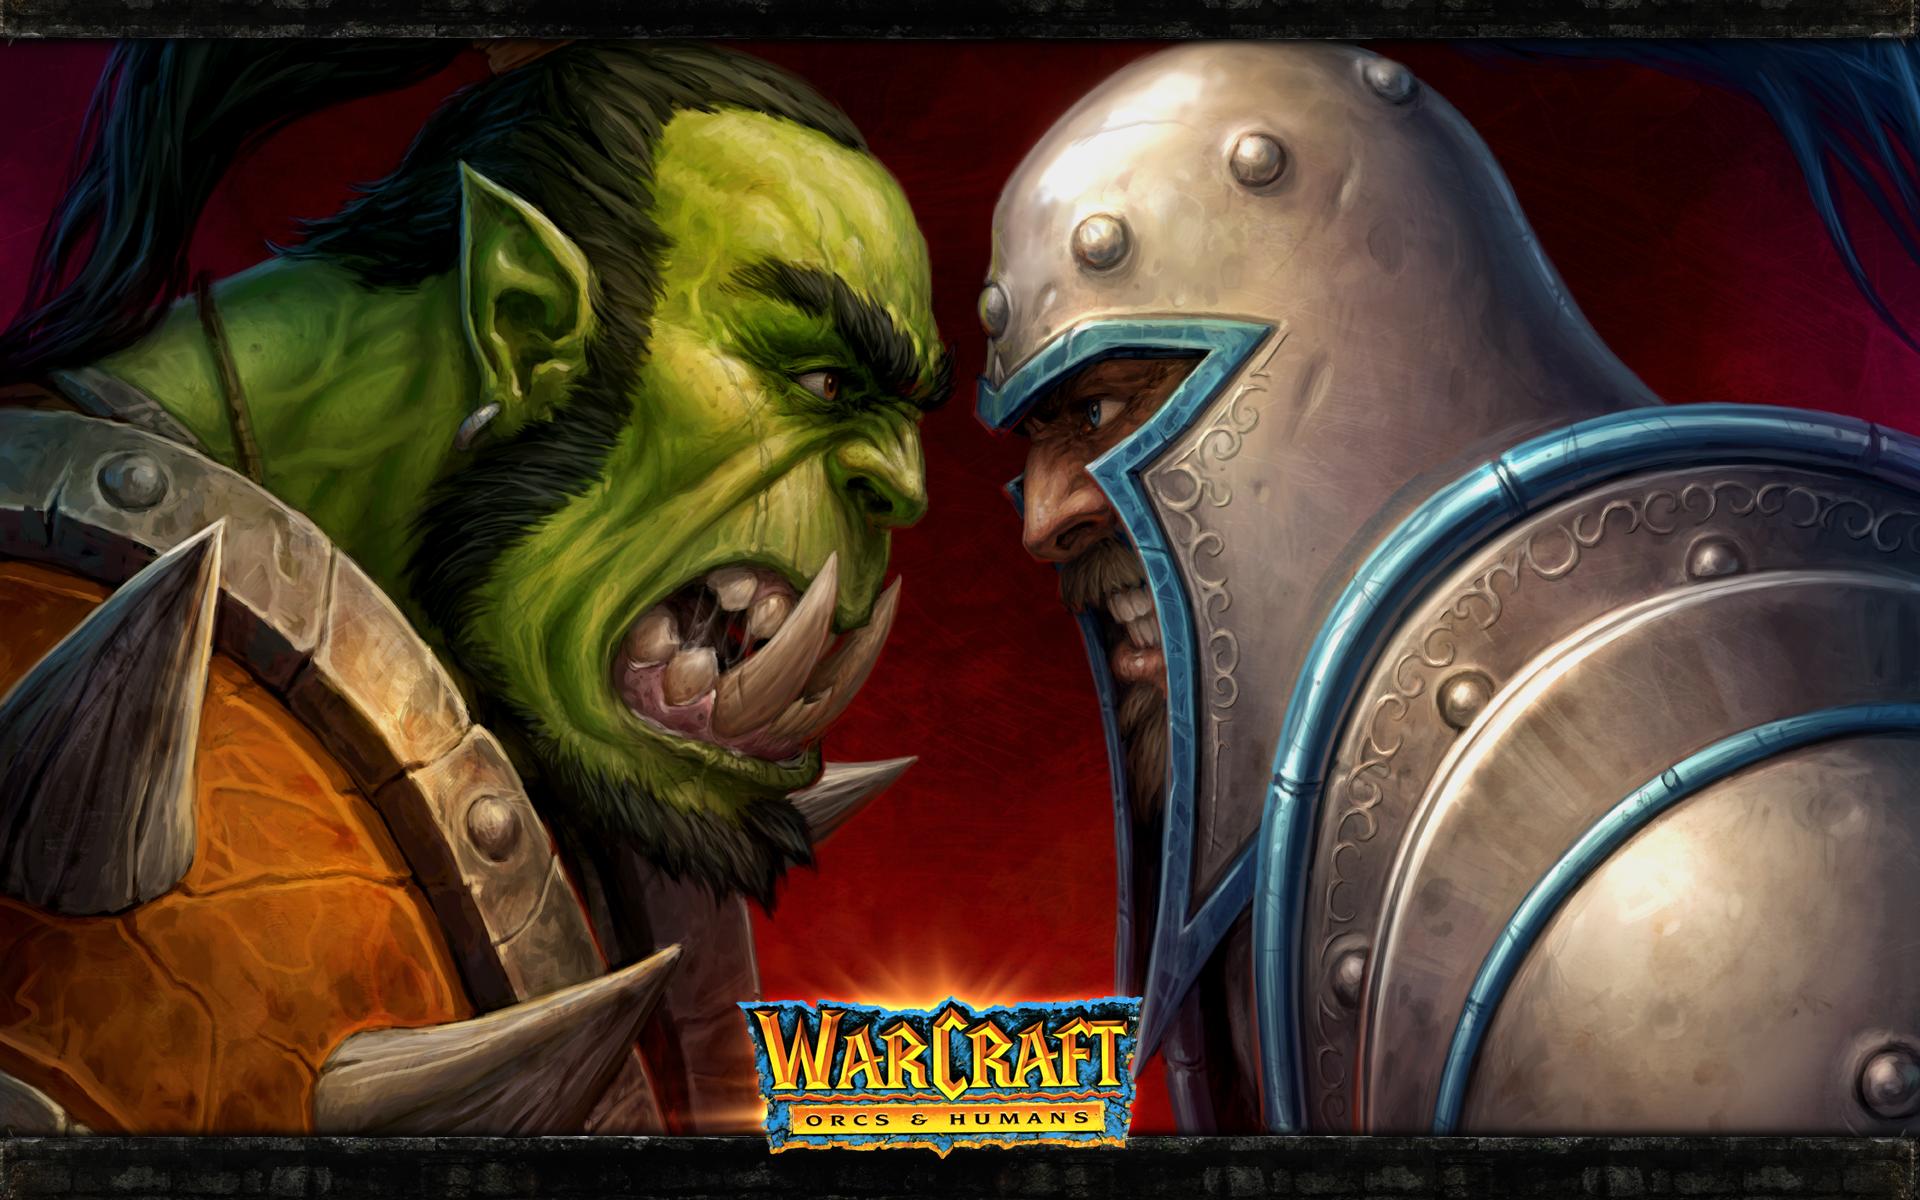 Warcraft human sex pic